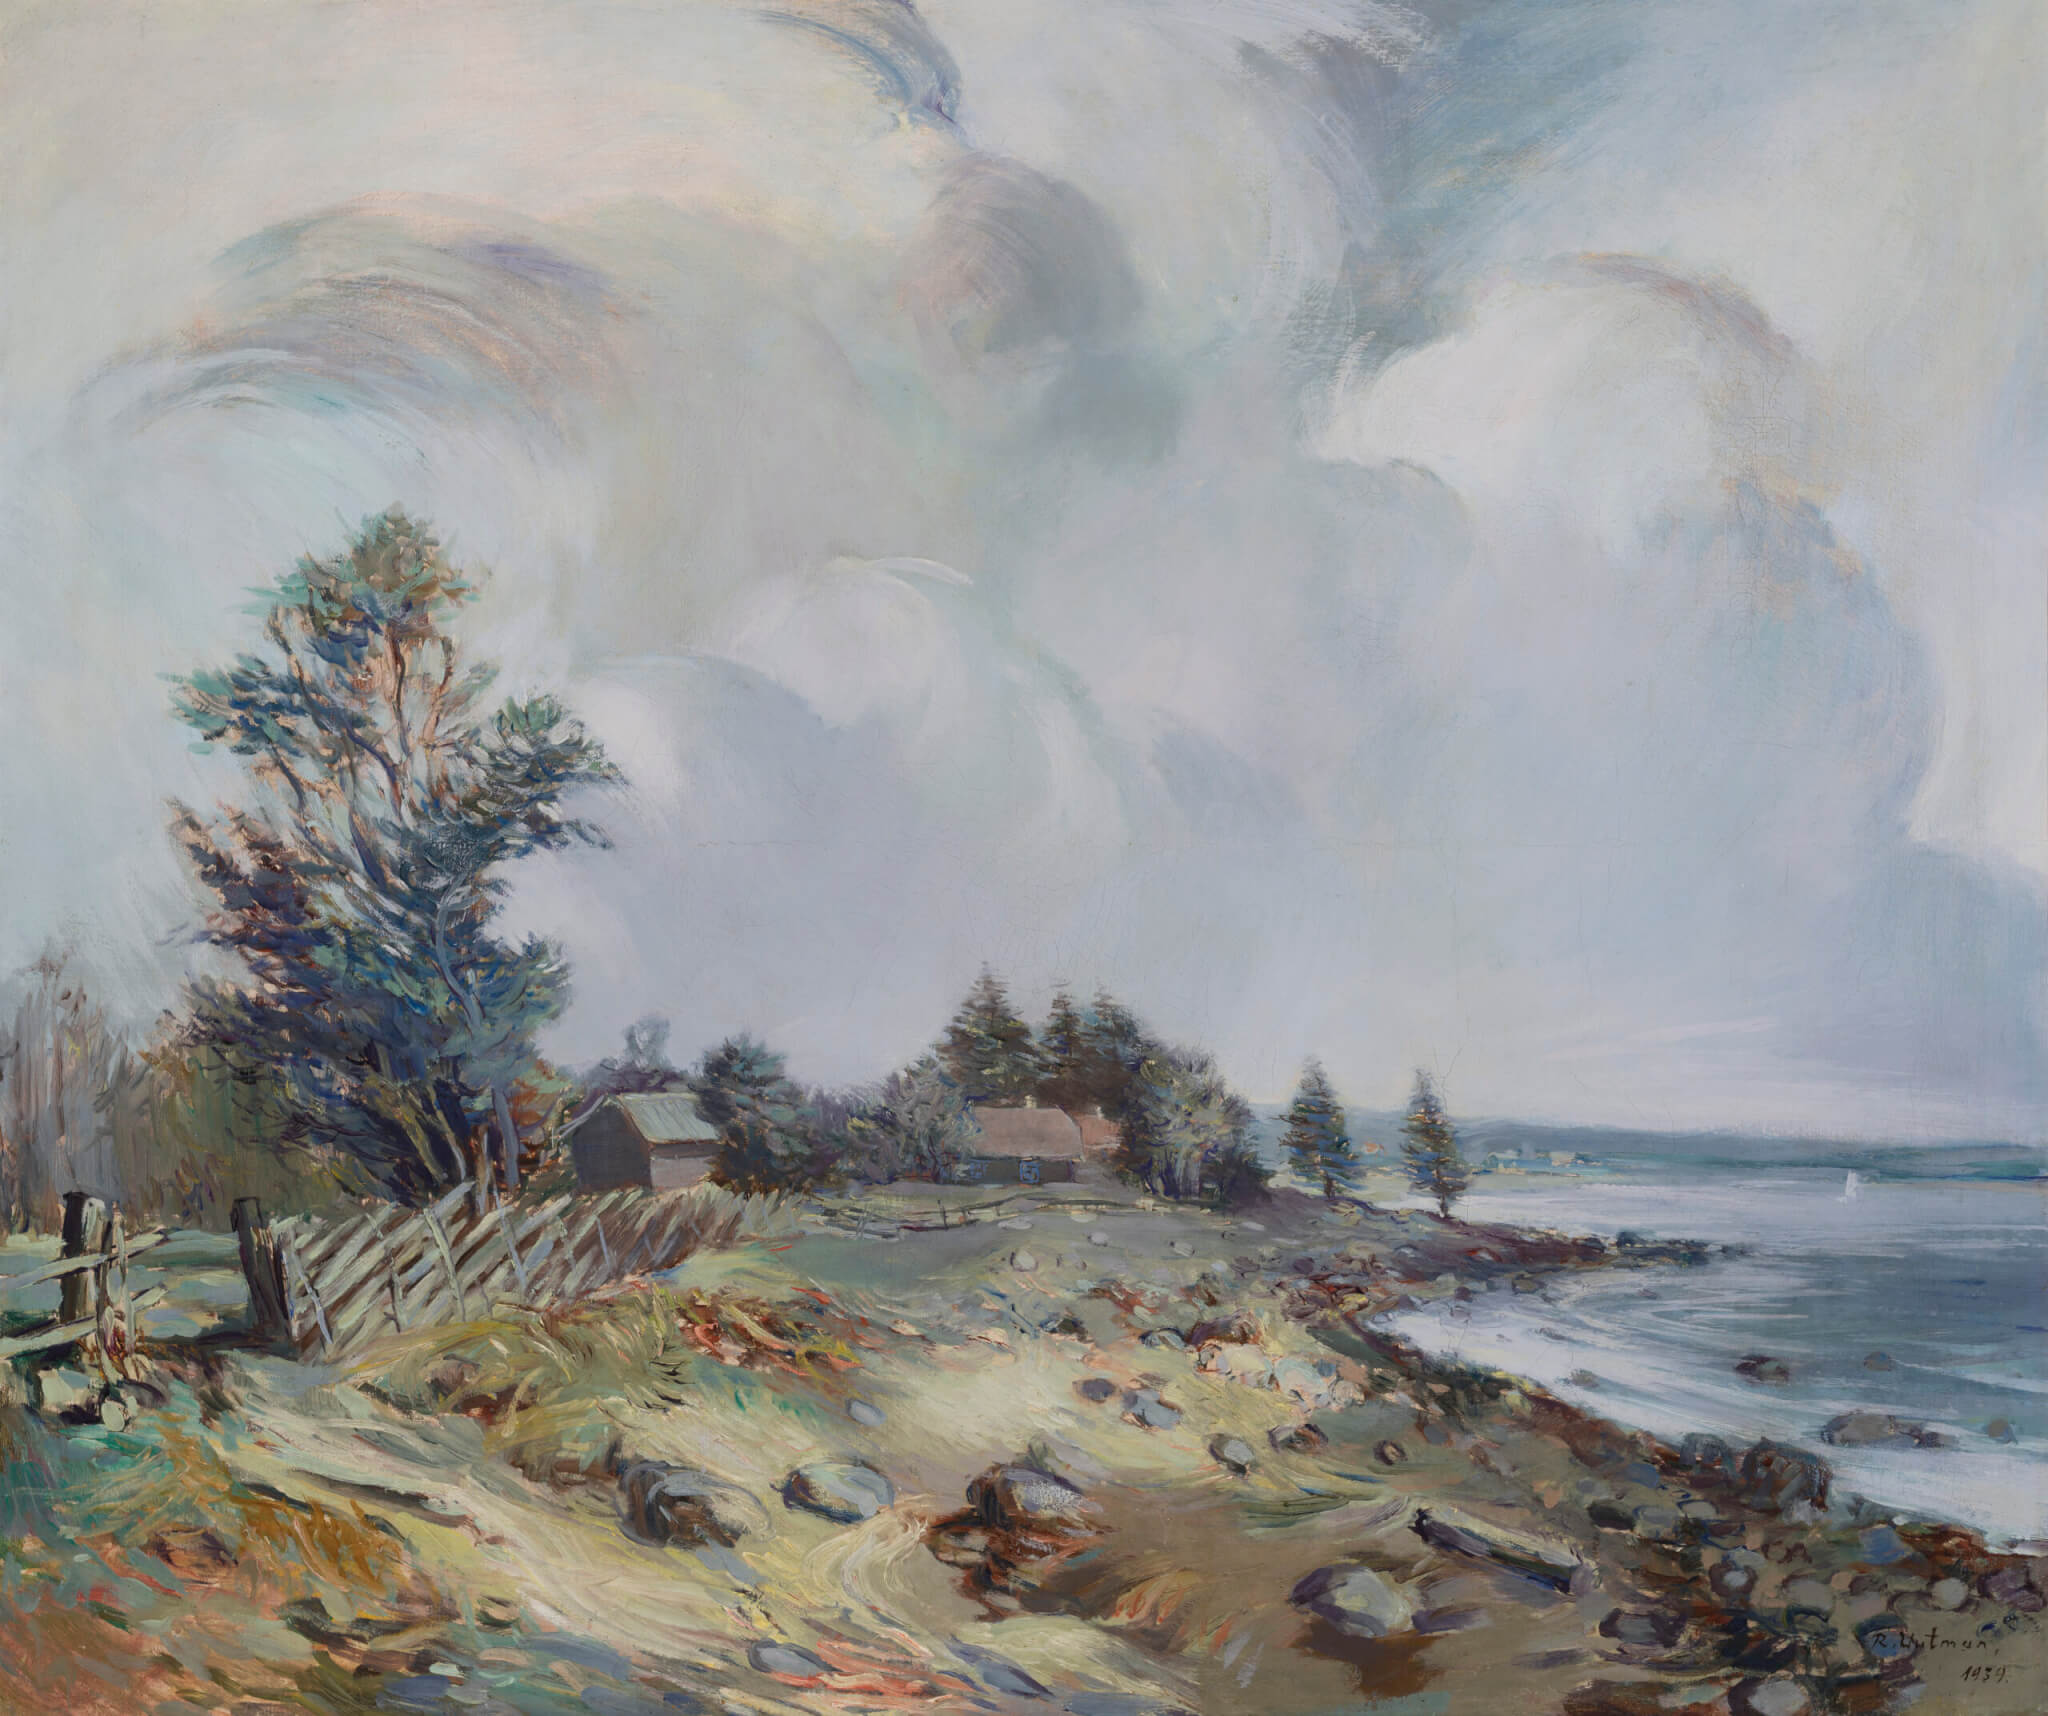 Richard-Uutmaa-kunstinäitus-Allee-galerii-Tallinnas